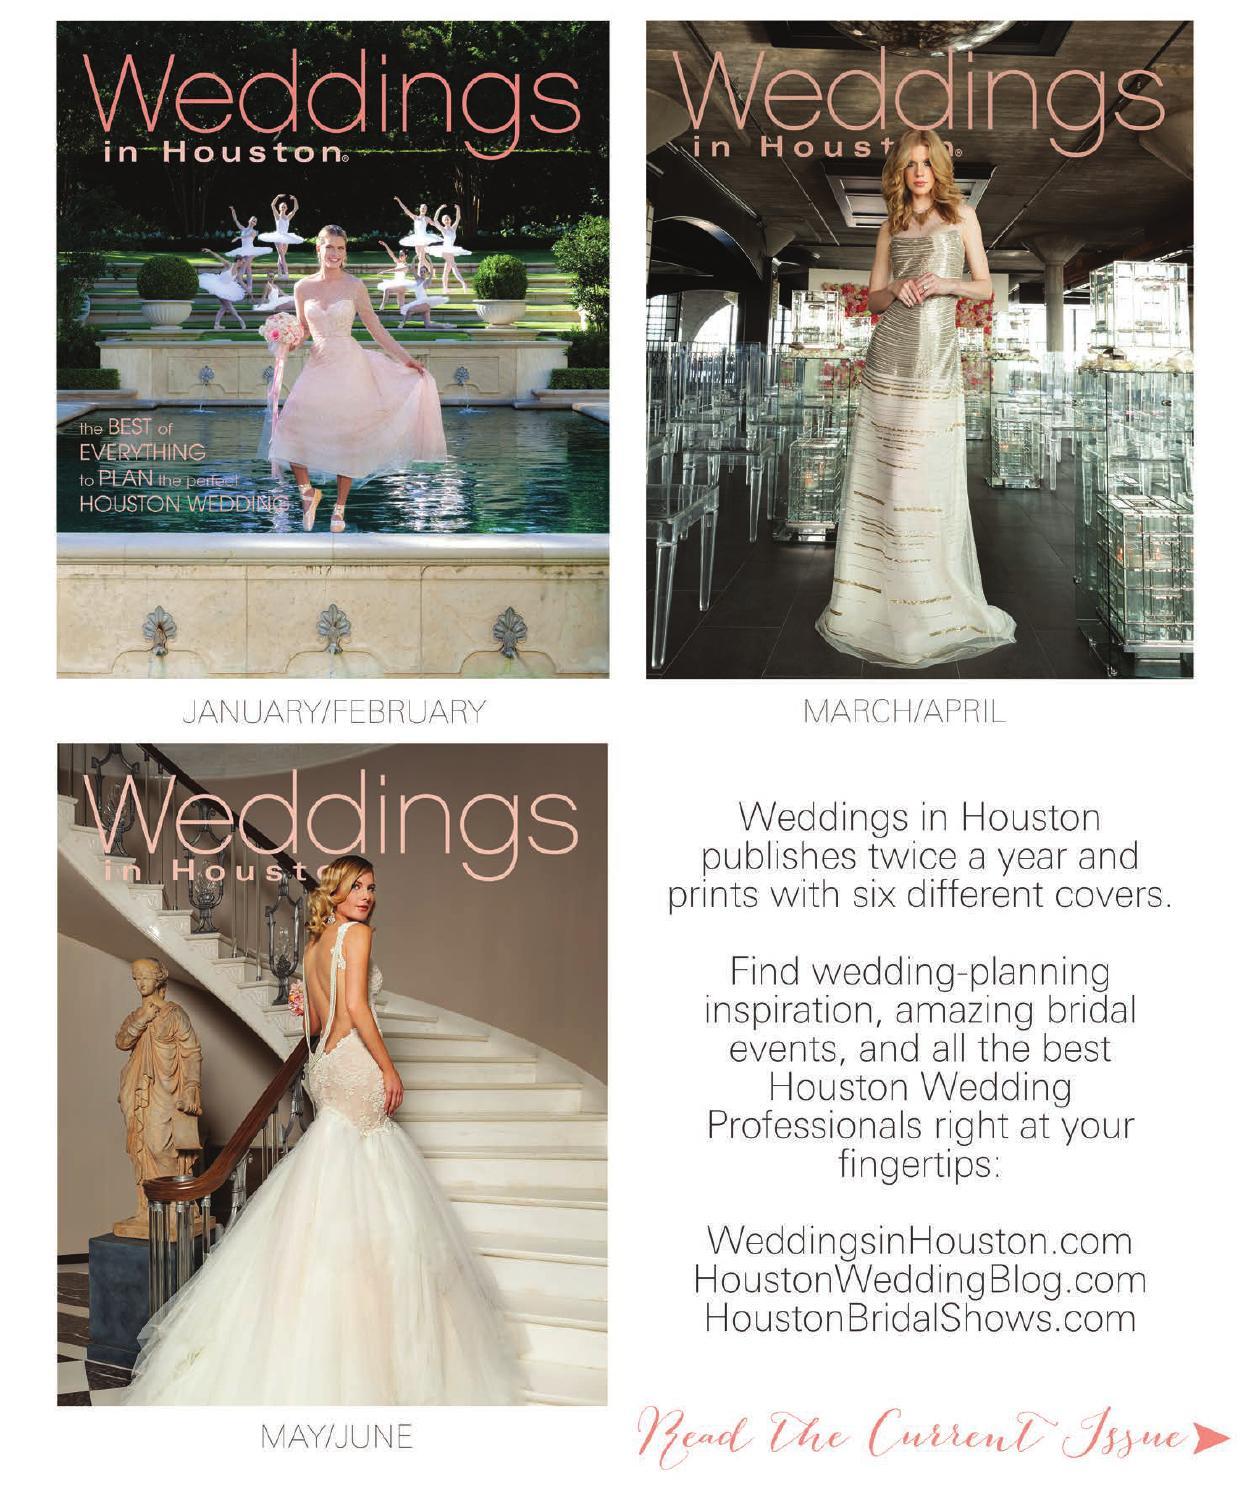 d0dab3236e9457 Weddings in Houston - JANUARY-JUNE 2015 by Weddings in Houston - issuu